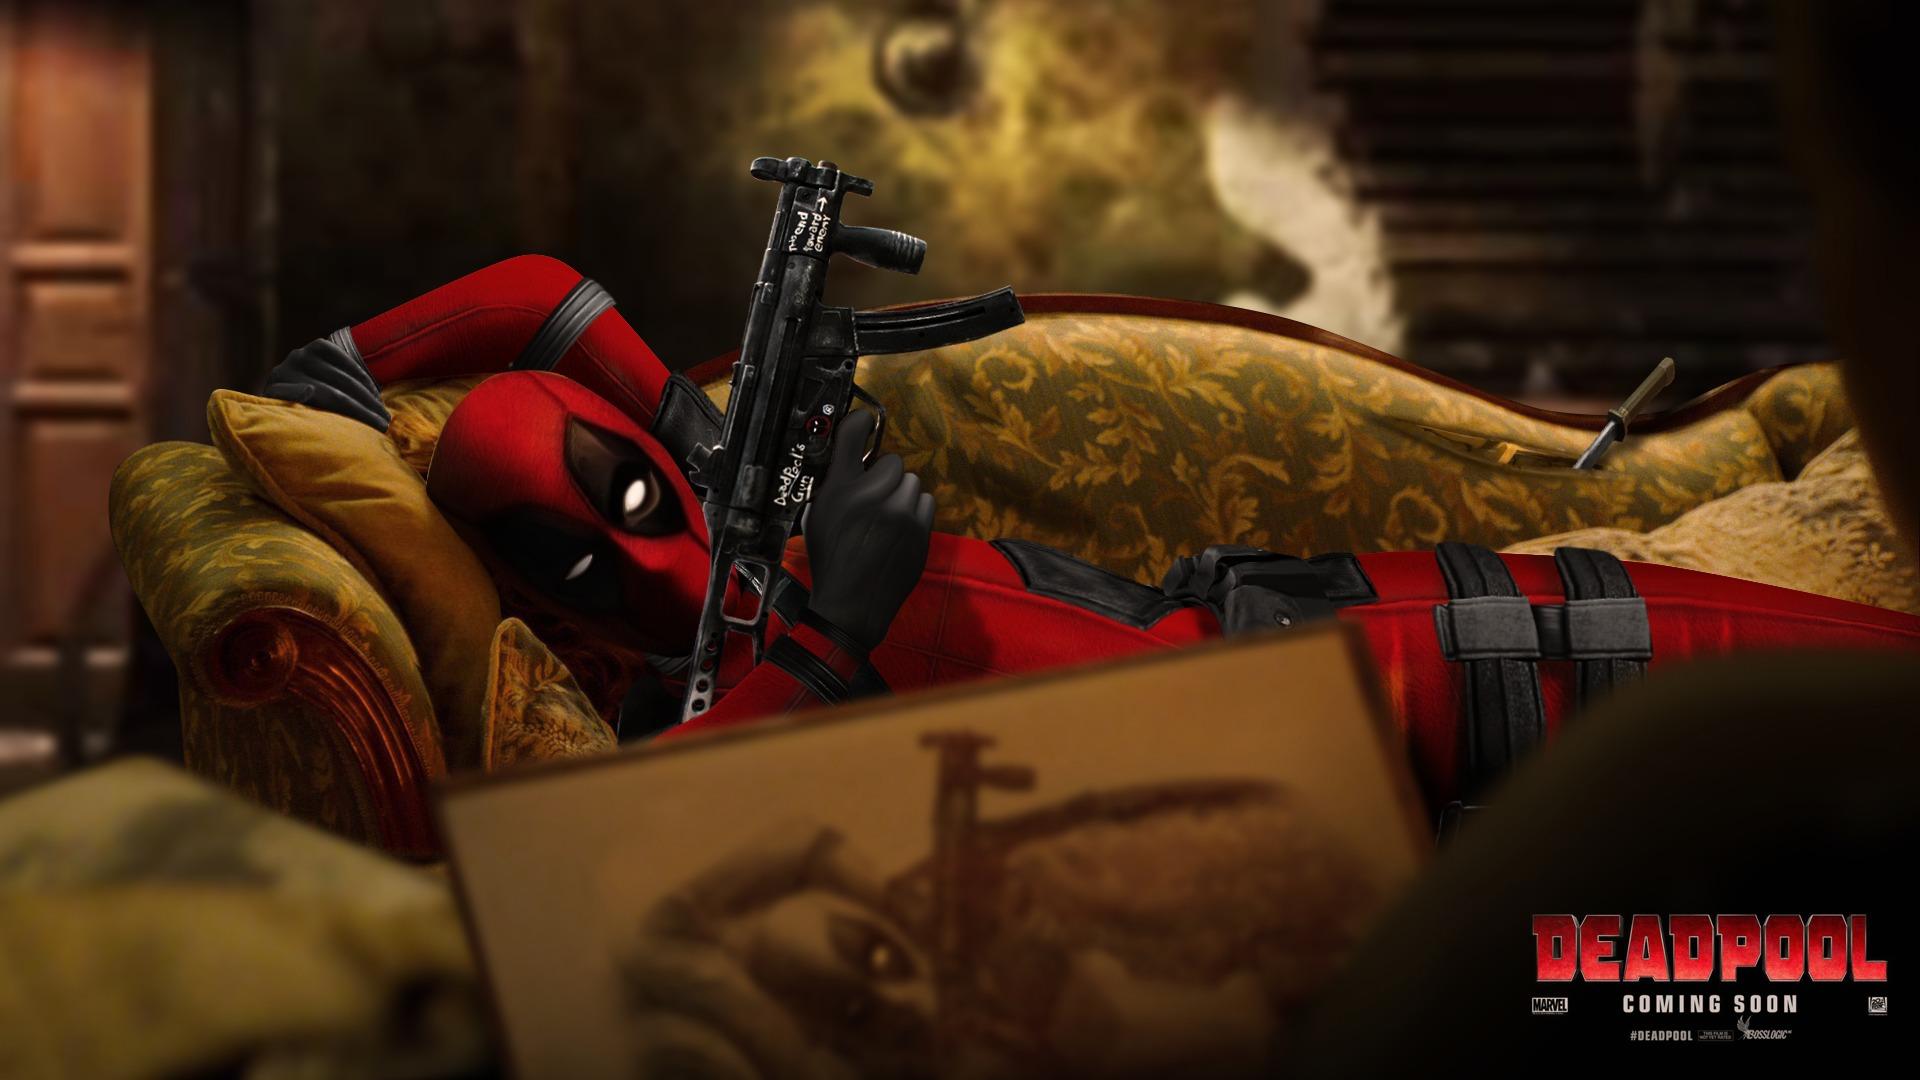 Deadpool Film Hd Wallpaper Background Image 1920x1080